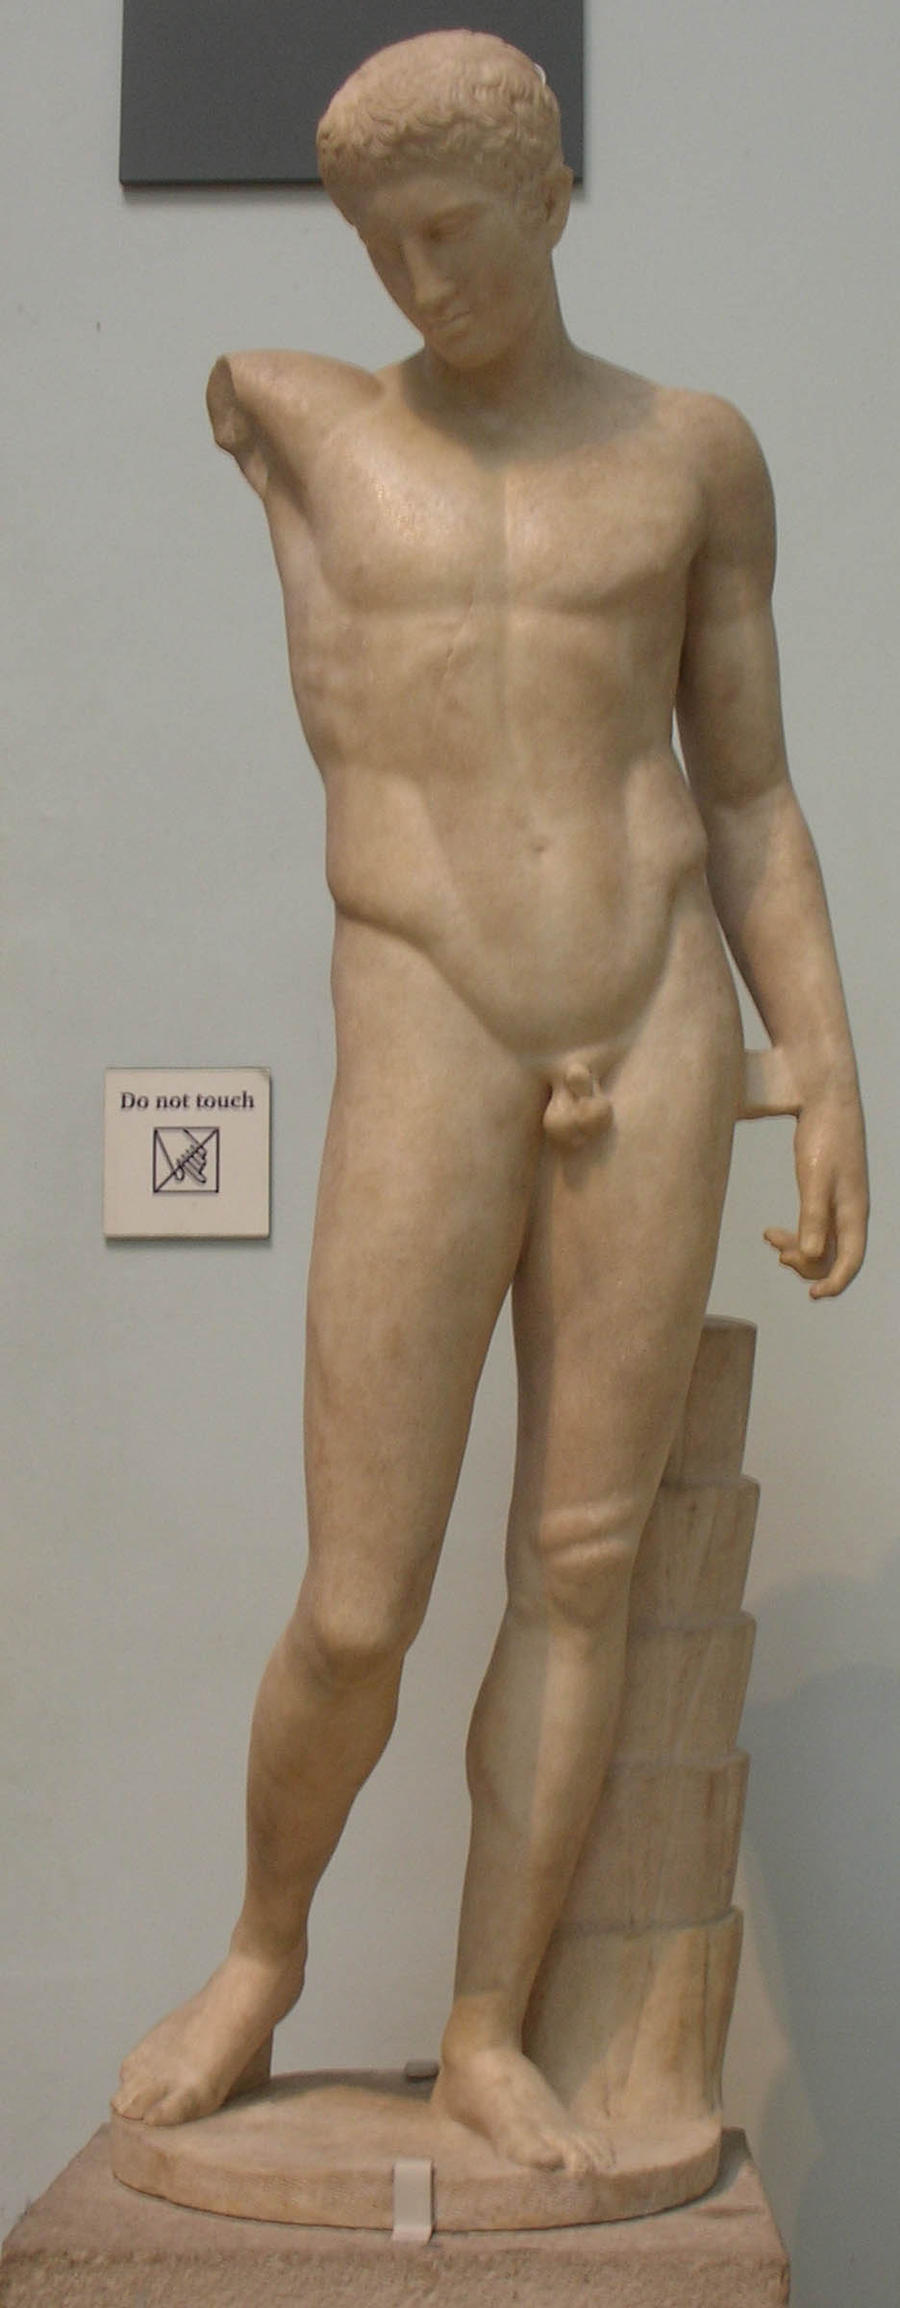 Greek Male Nude Statue By Photodash On Deviantart-9187